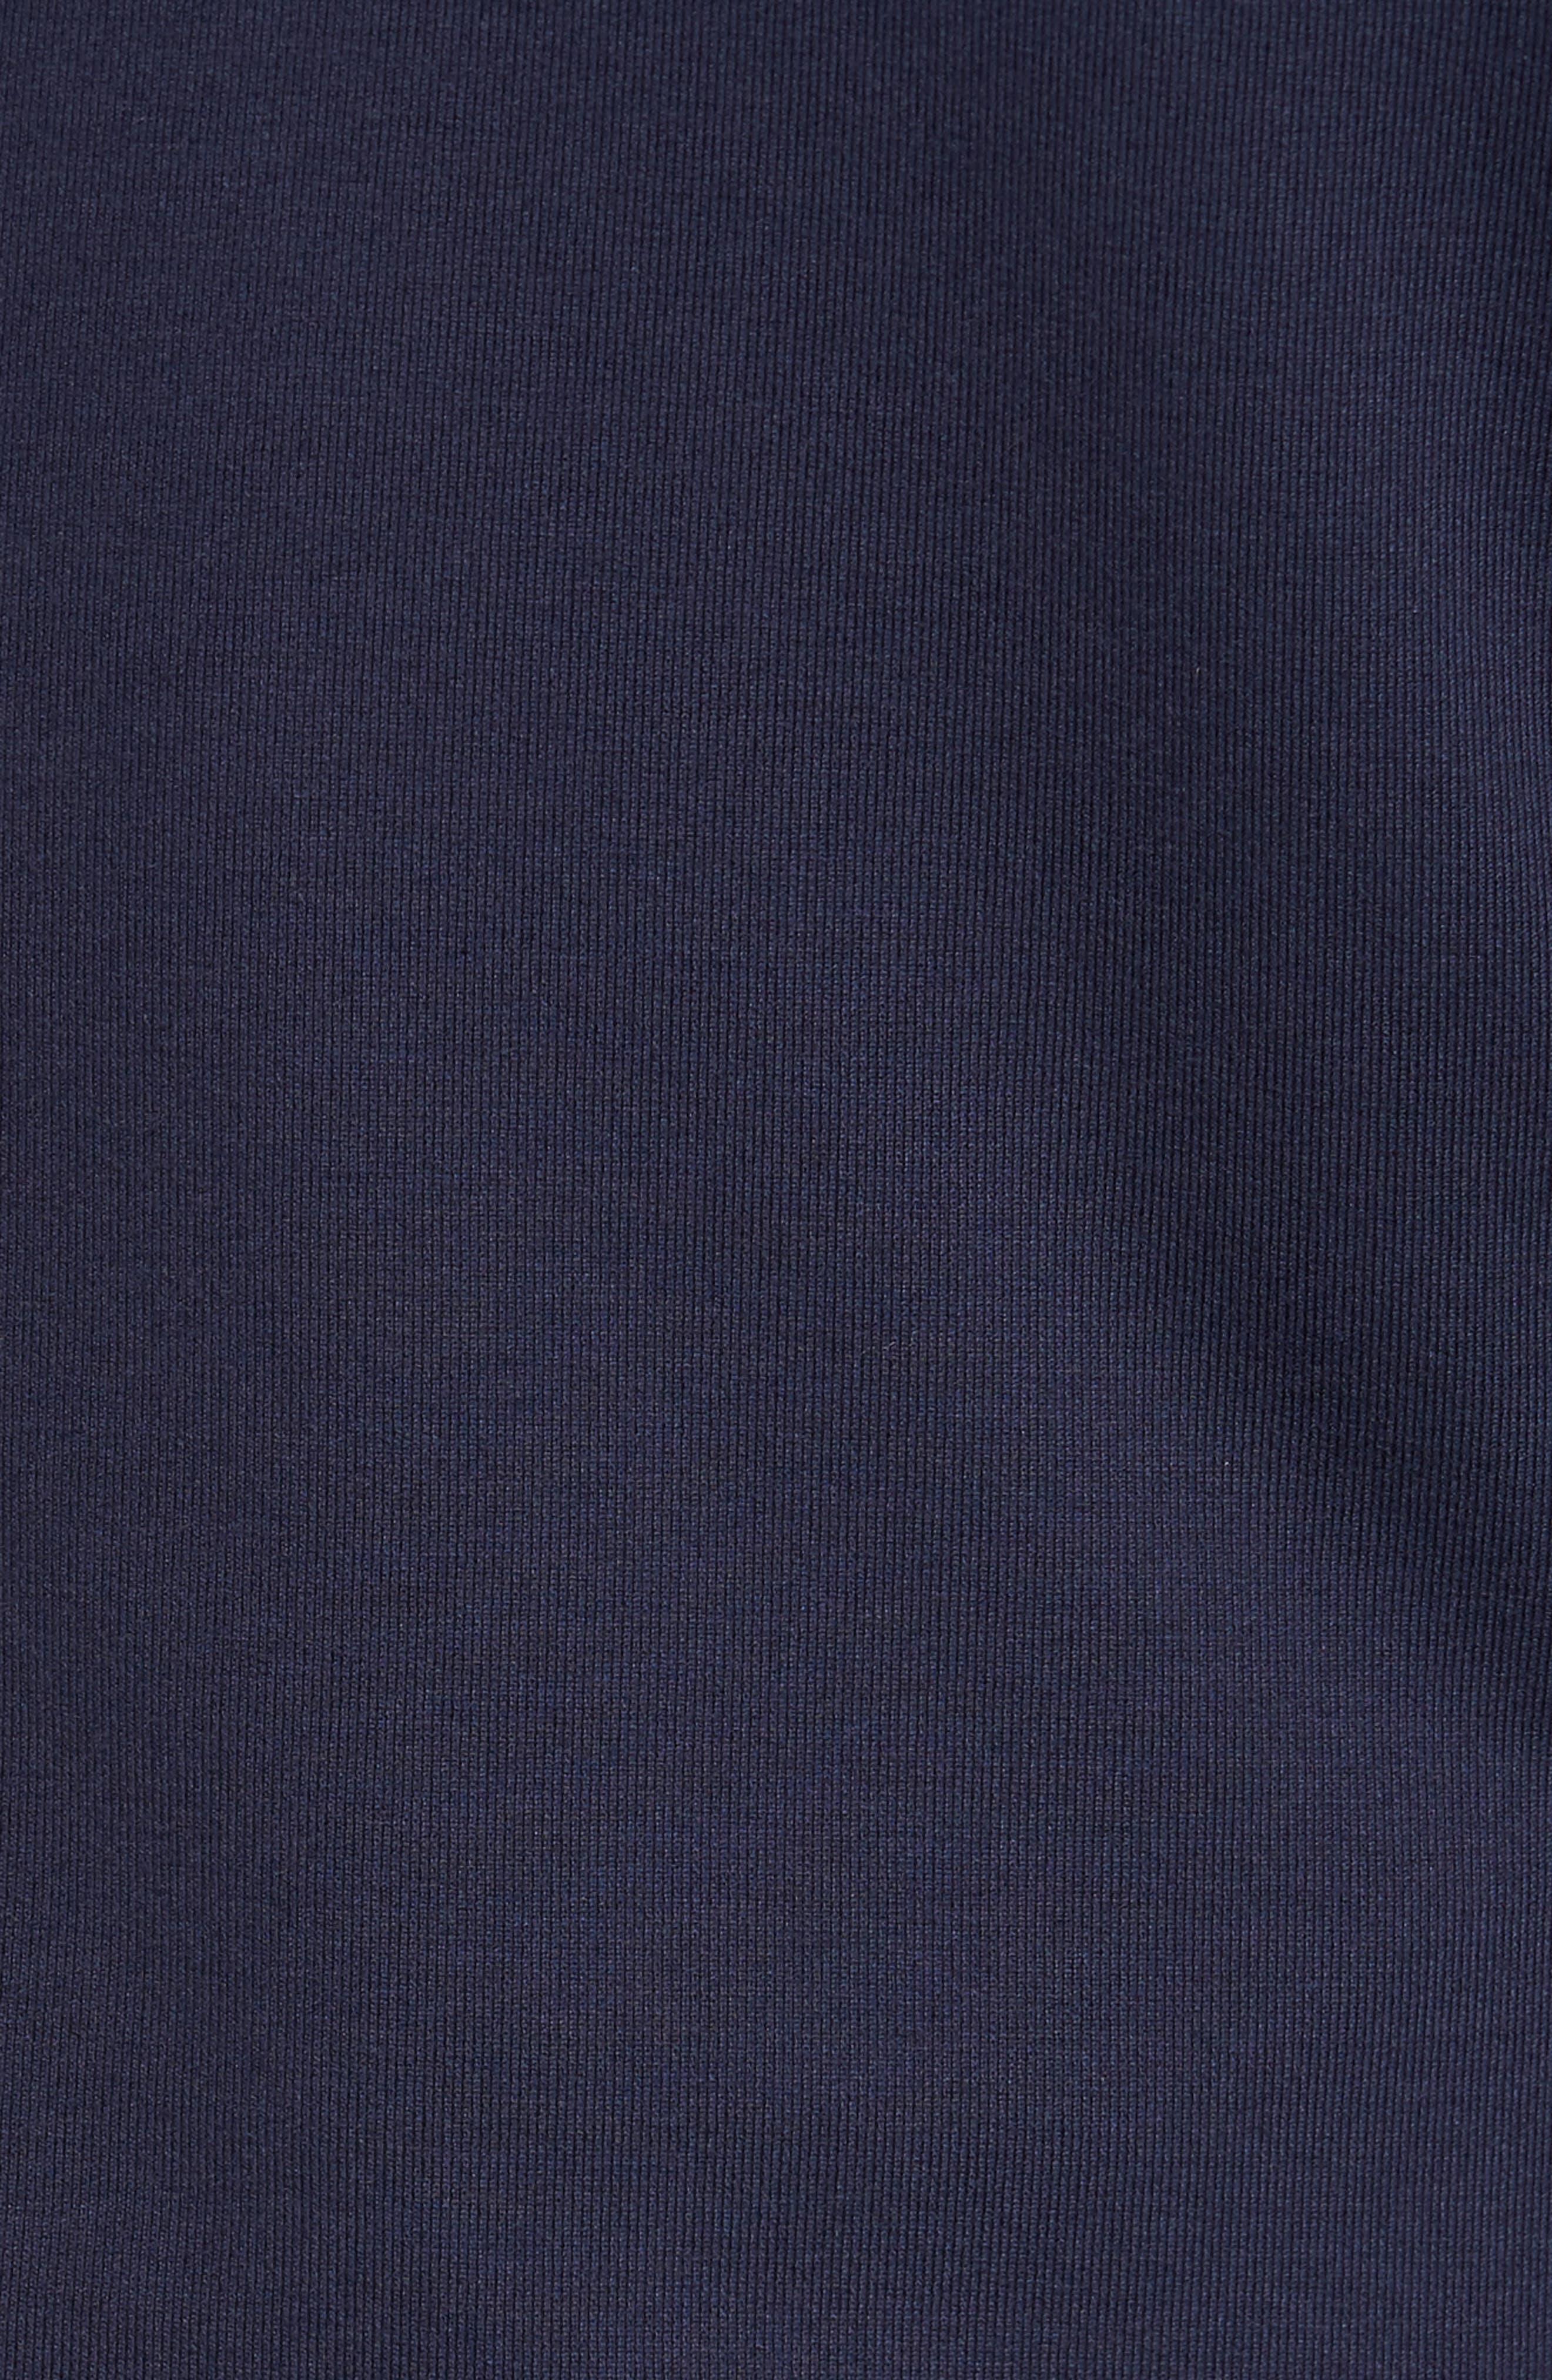 Alternate Image 5  - Peter Millar Collection Santorini Jersey Knit Jacket